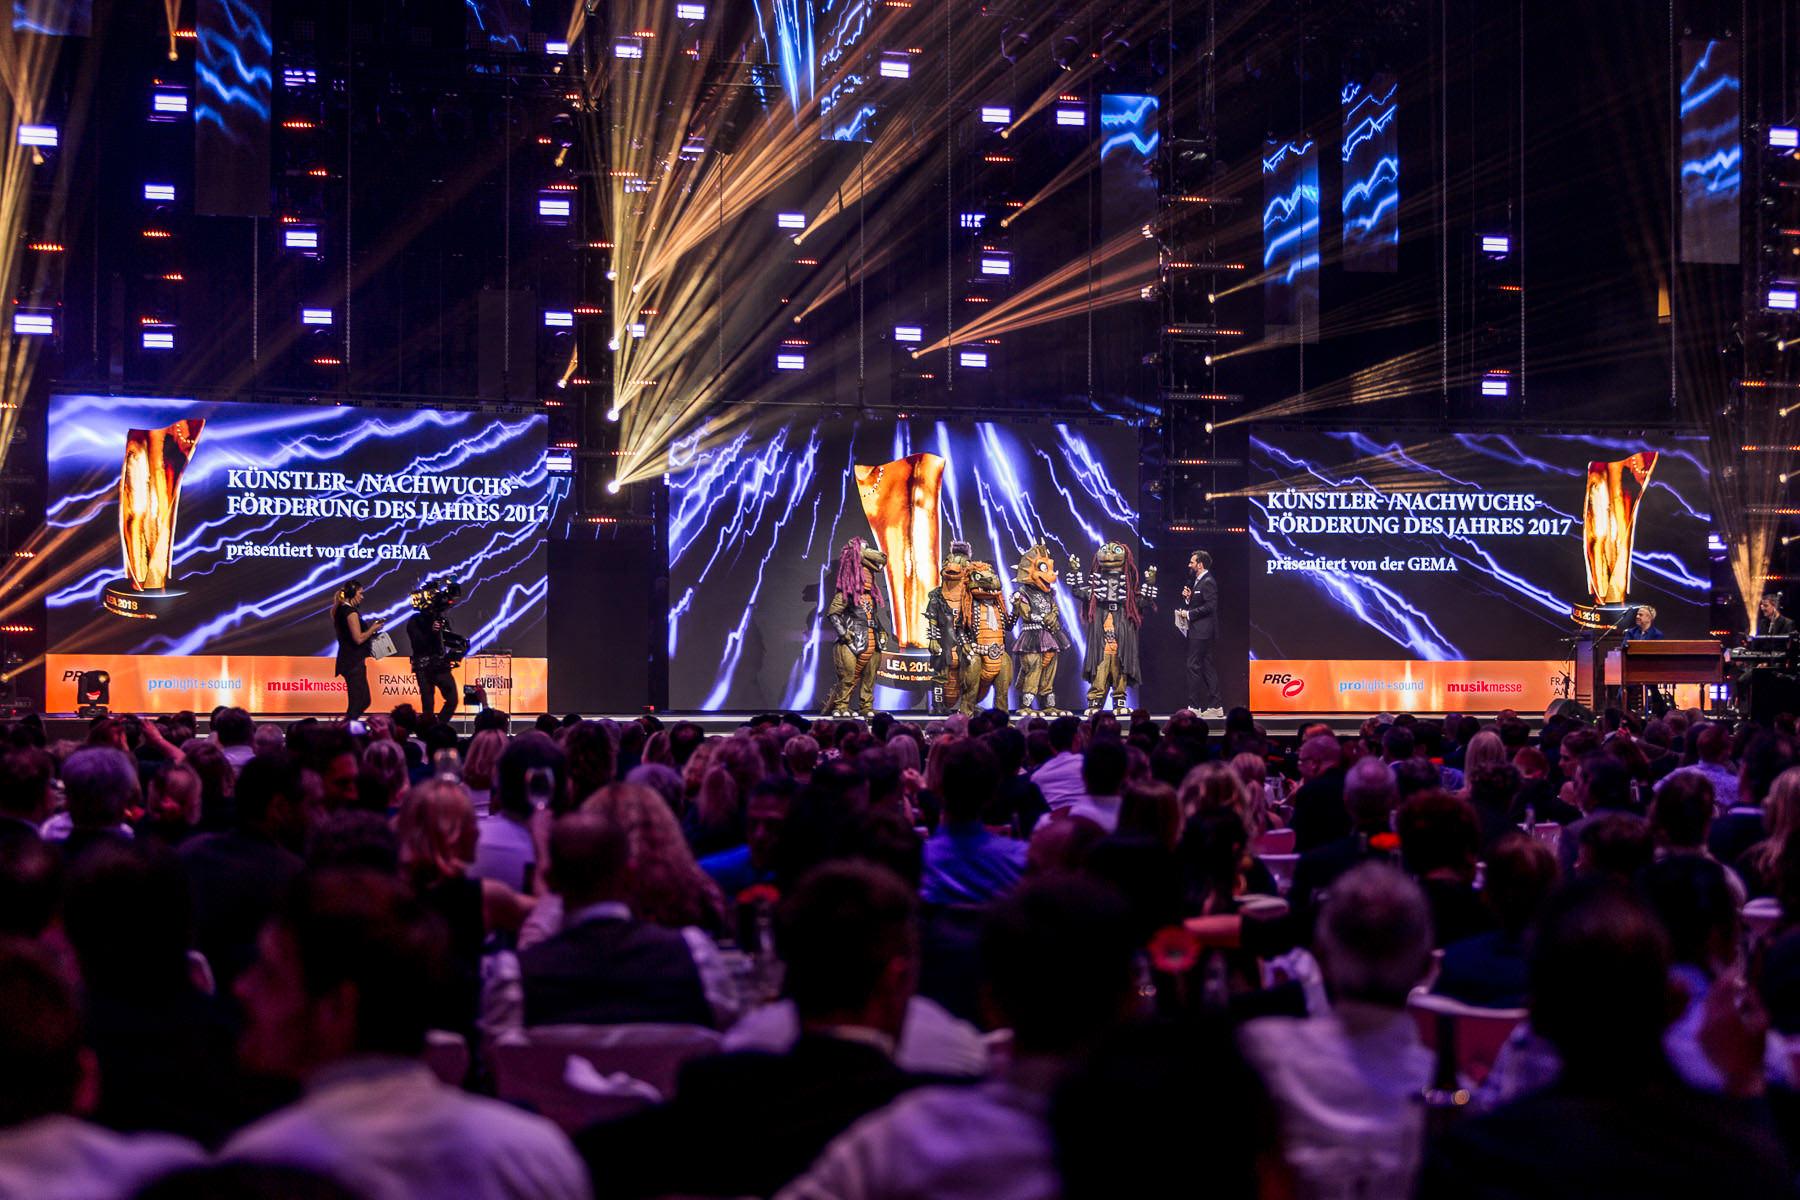 Eventfotos - Veranstaltungsfotograf - Heavysaurus beim LEA-Award in Frankfurt